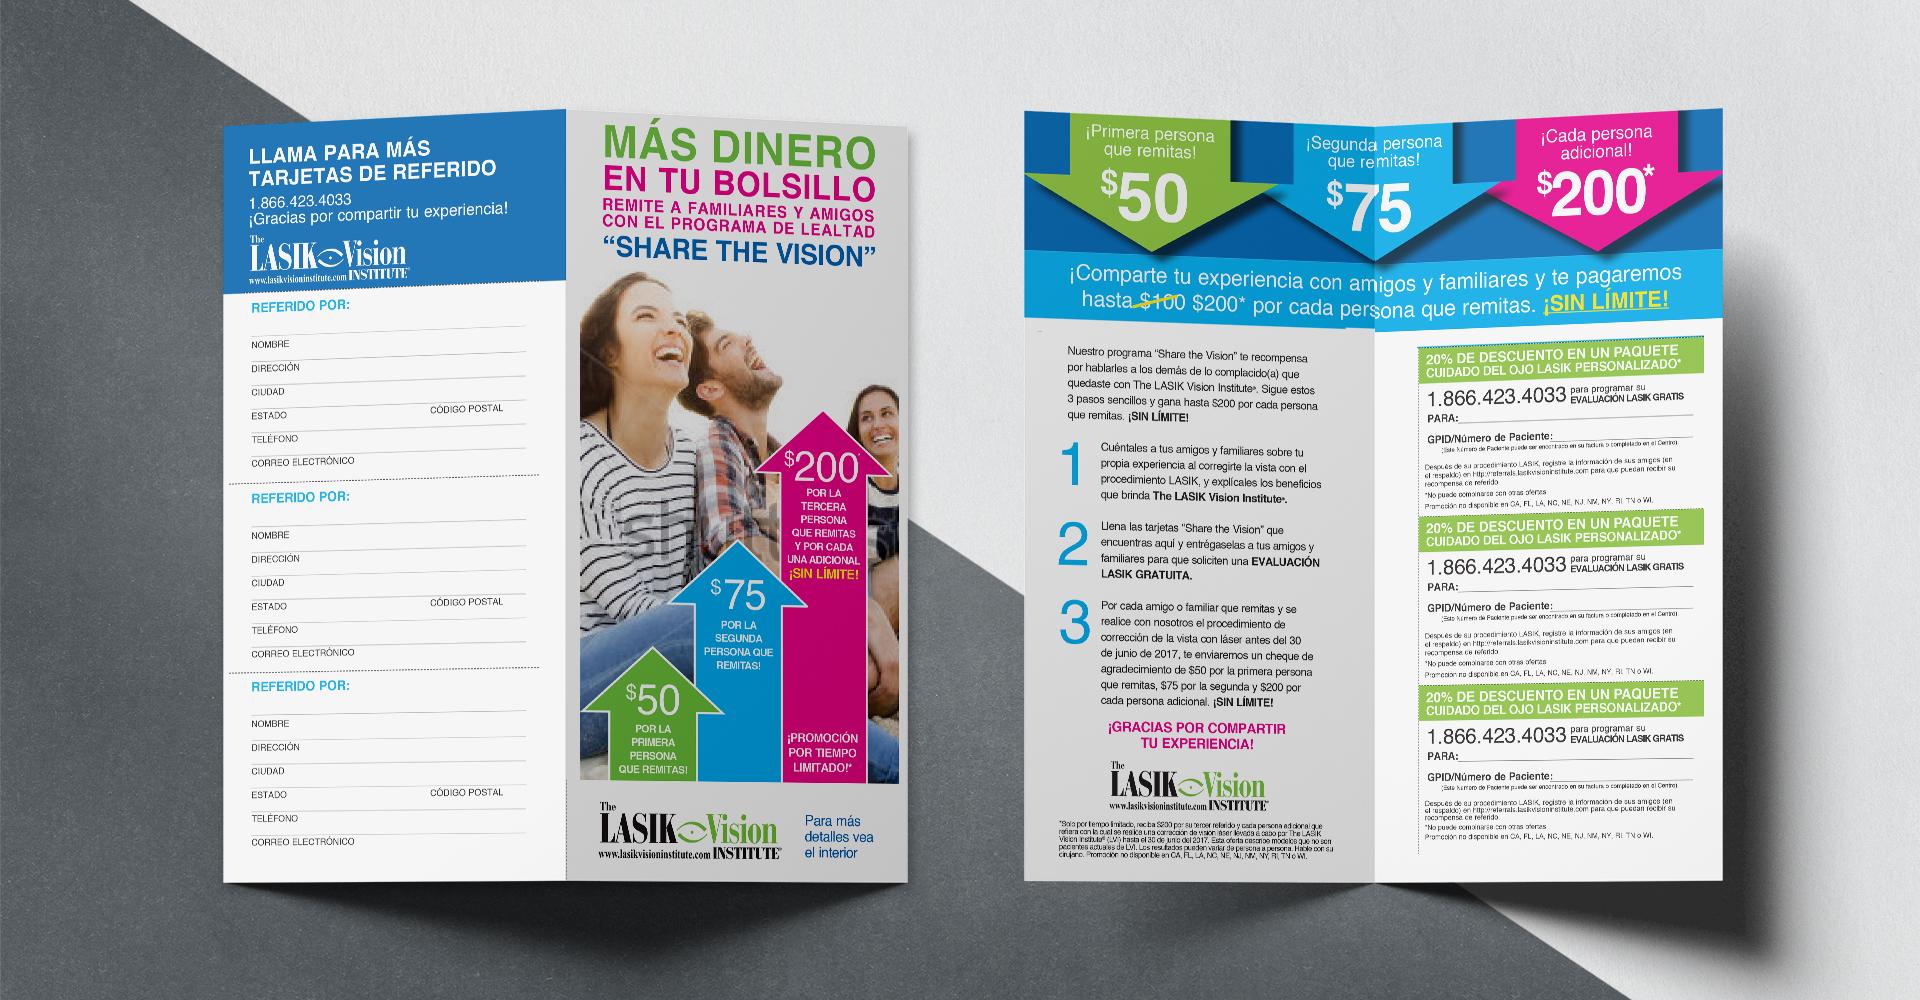 The Lasik Vision Institute brochure